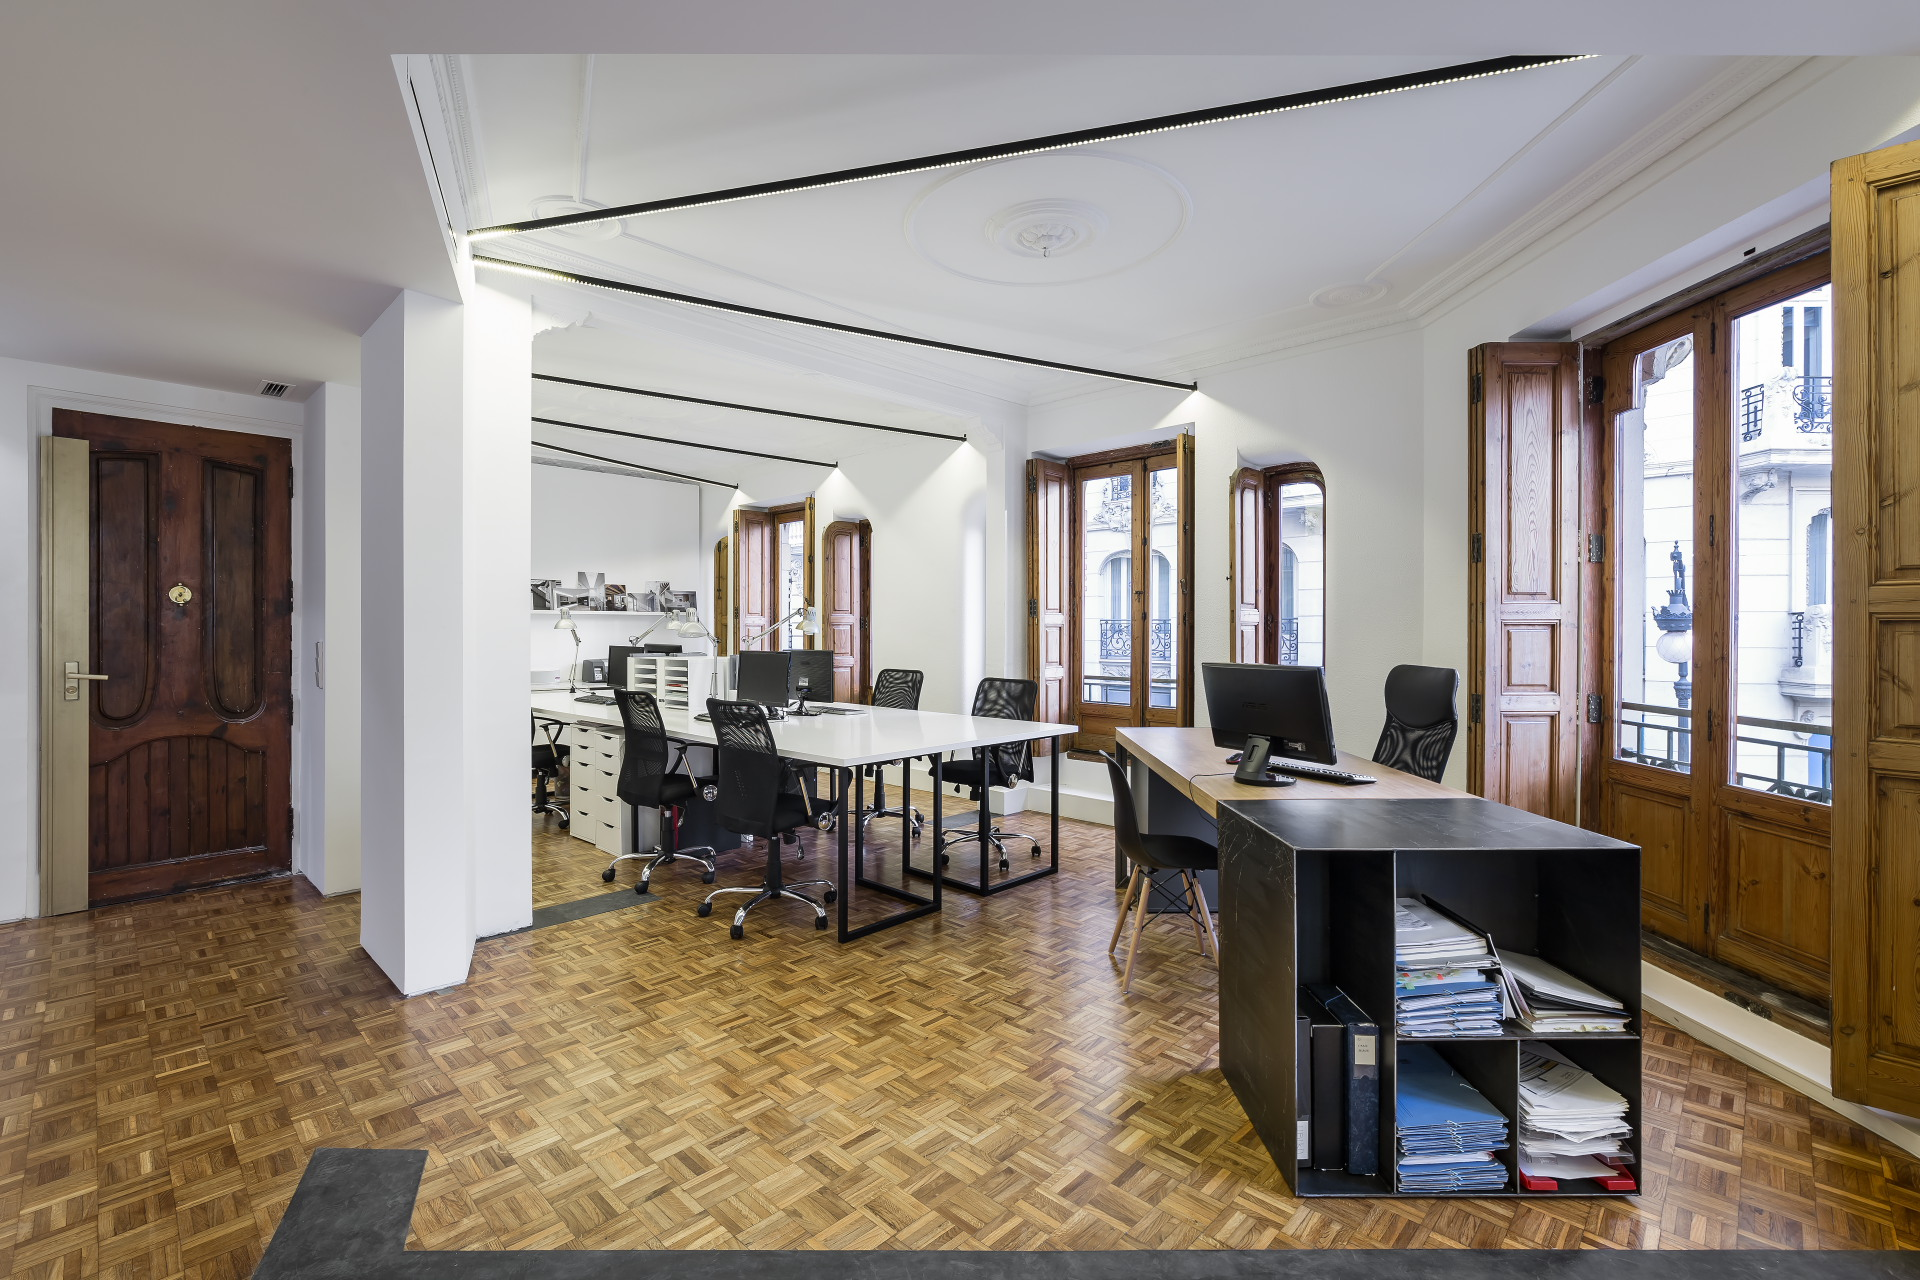 fotografia-arquitectura-interiorismo-valencia-german-cabo-viraje-estudio-pujol (3)